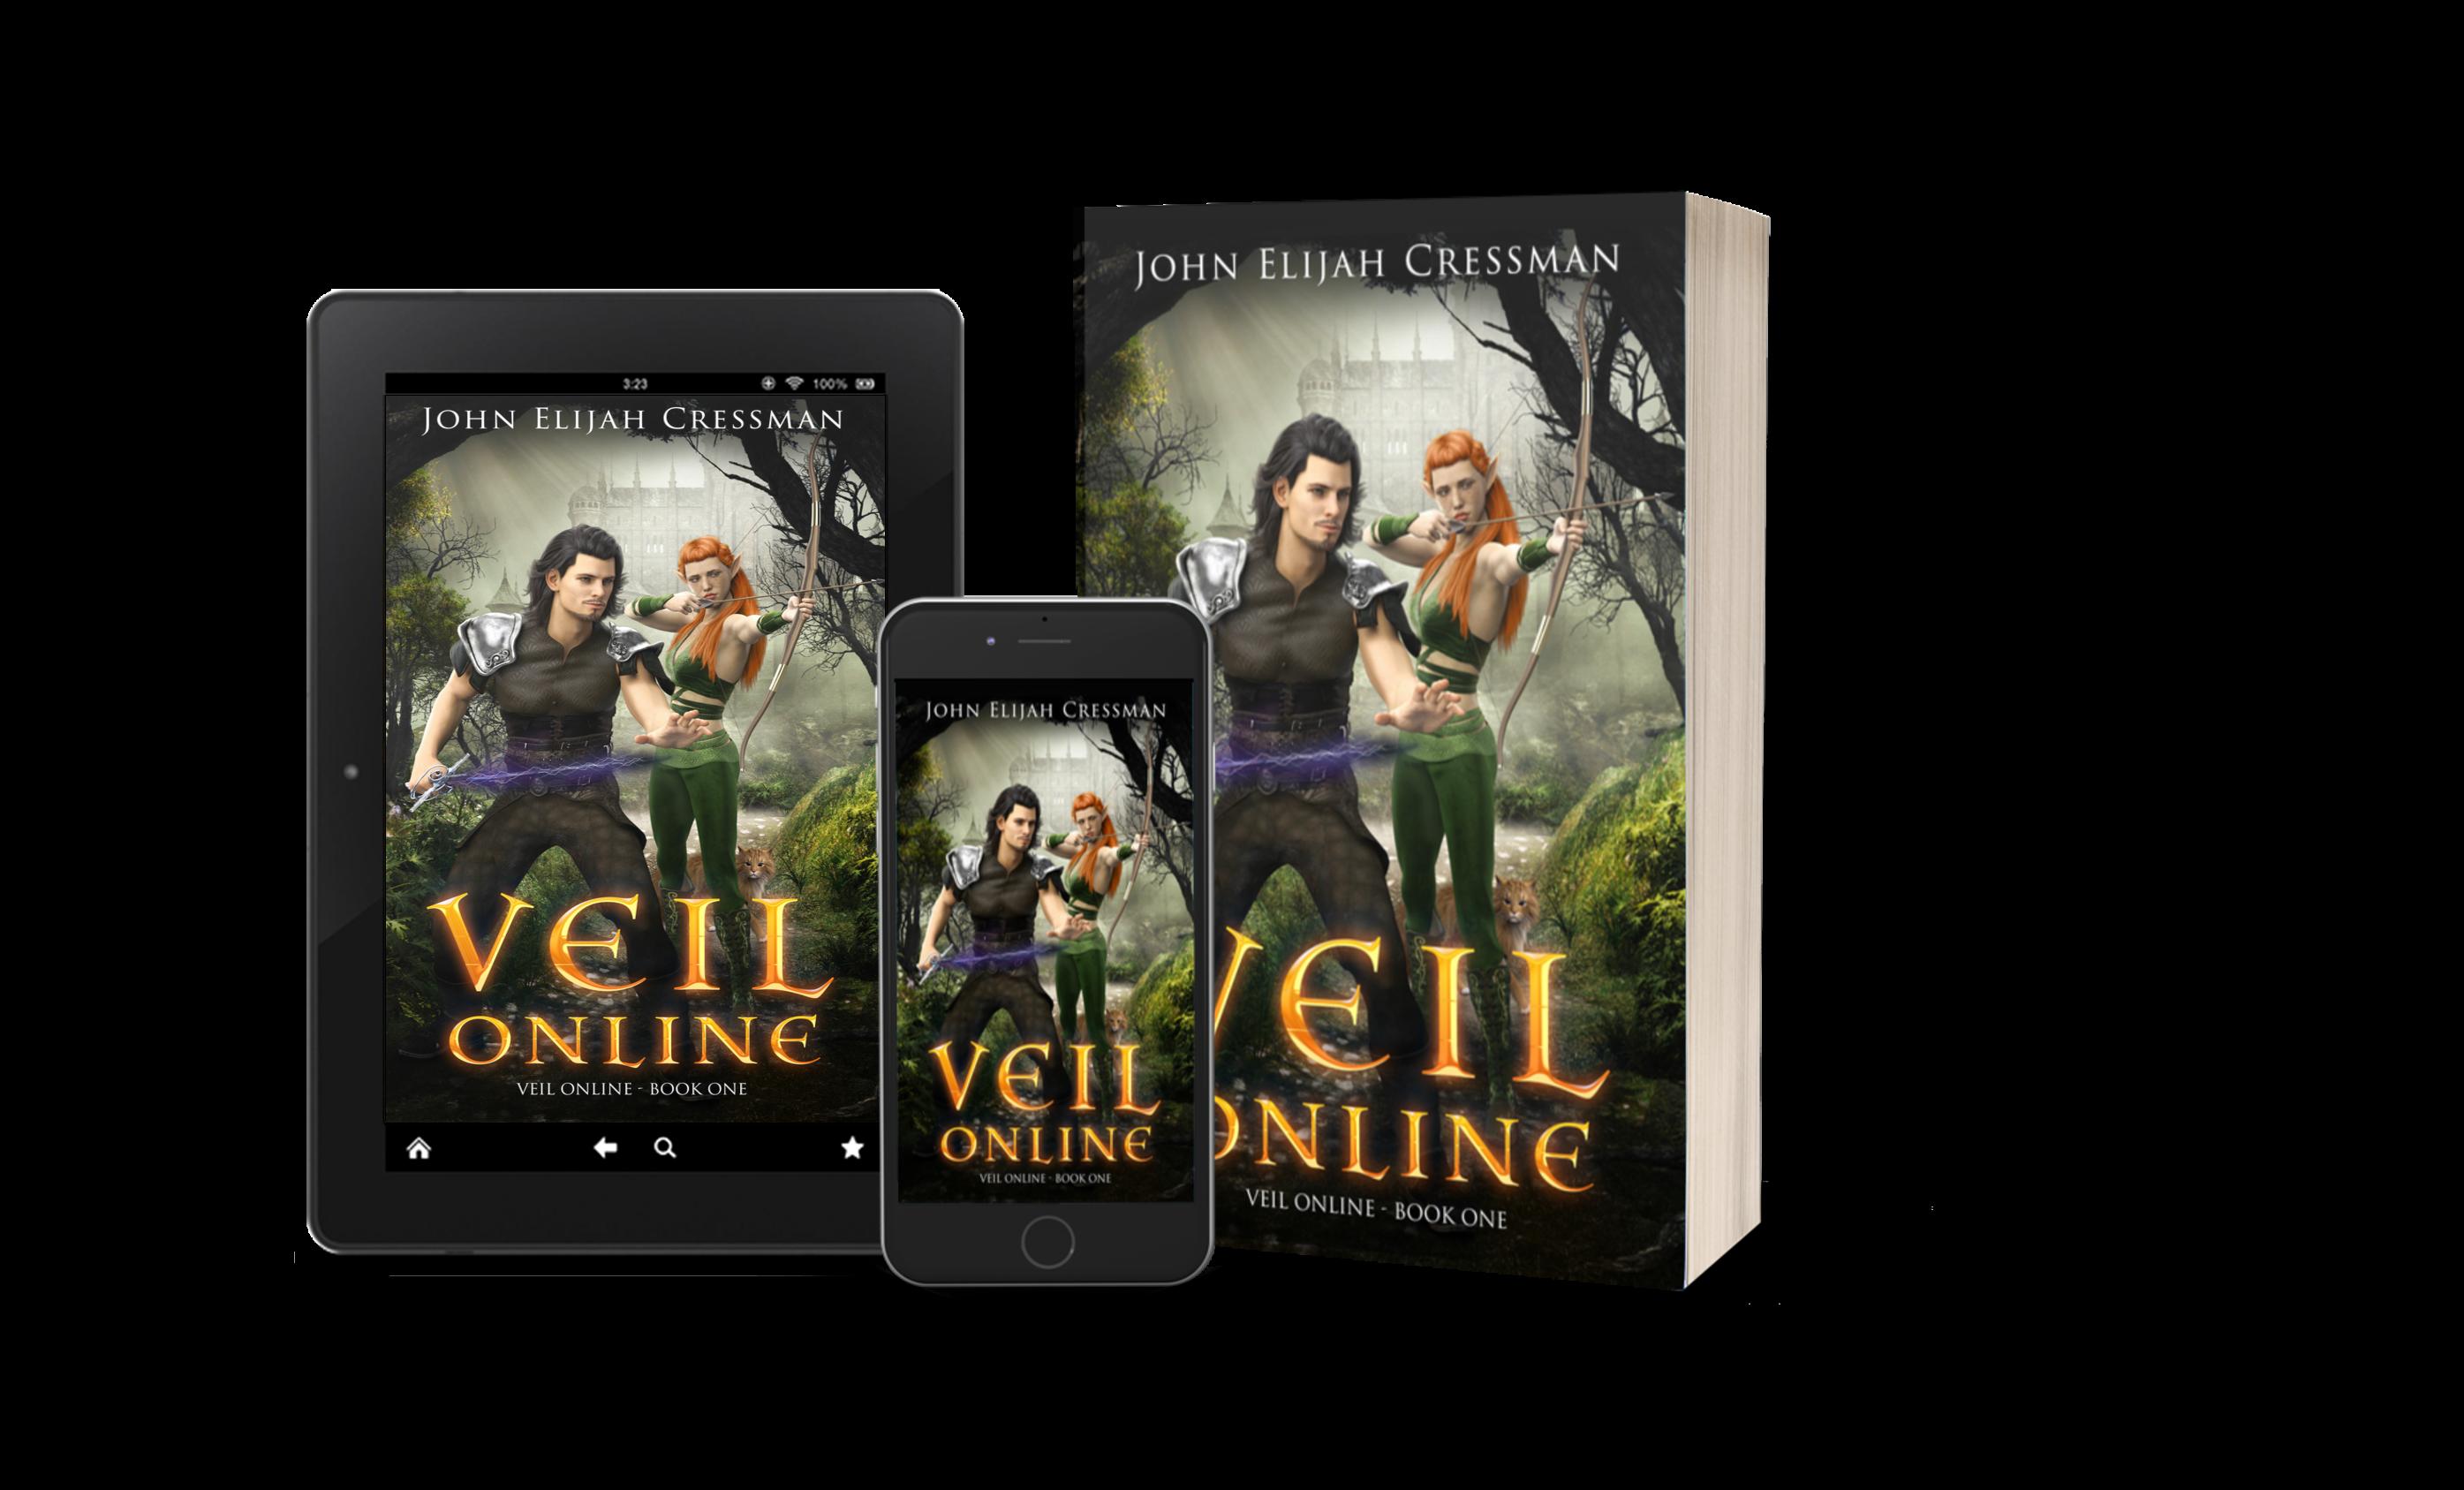 VEIL Online – Book 1 Summary